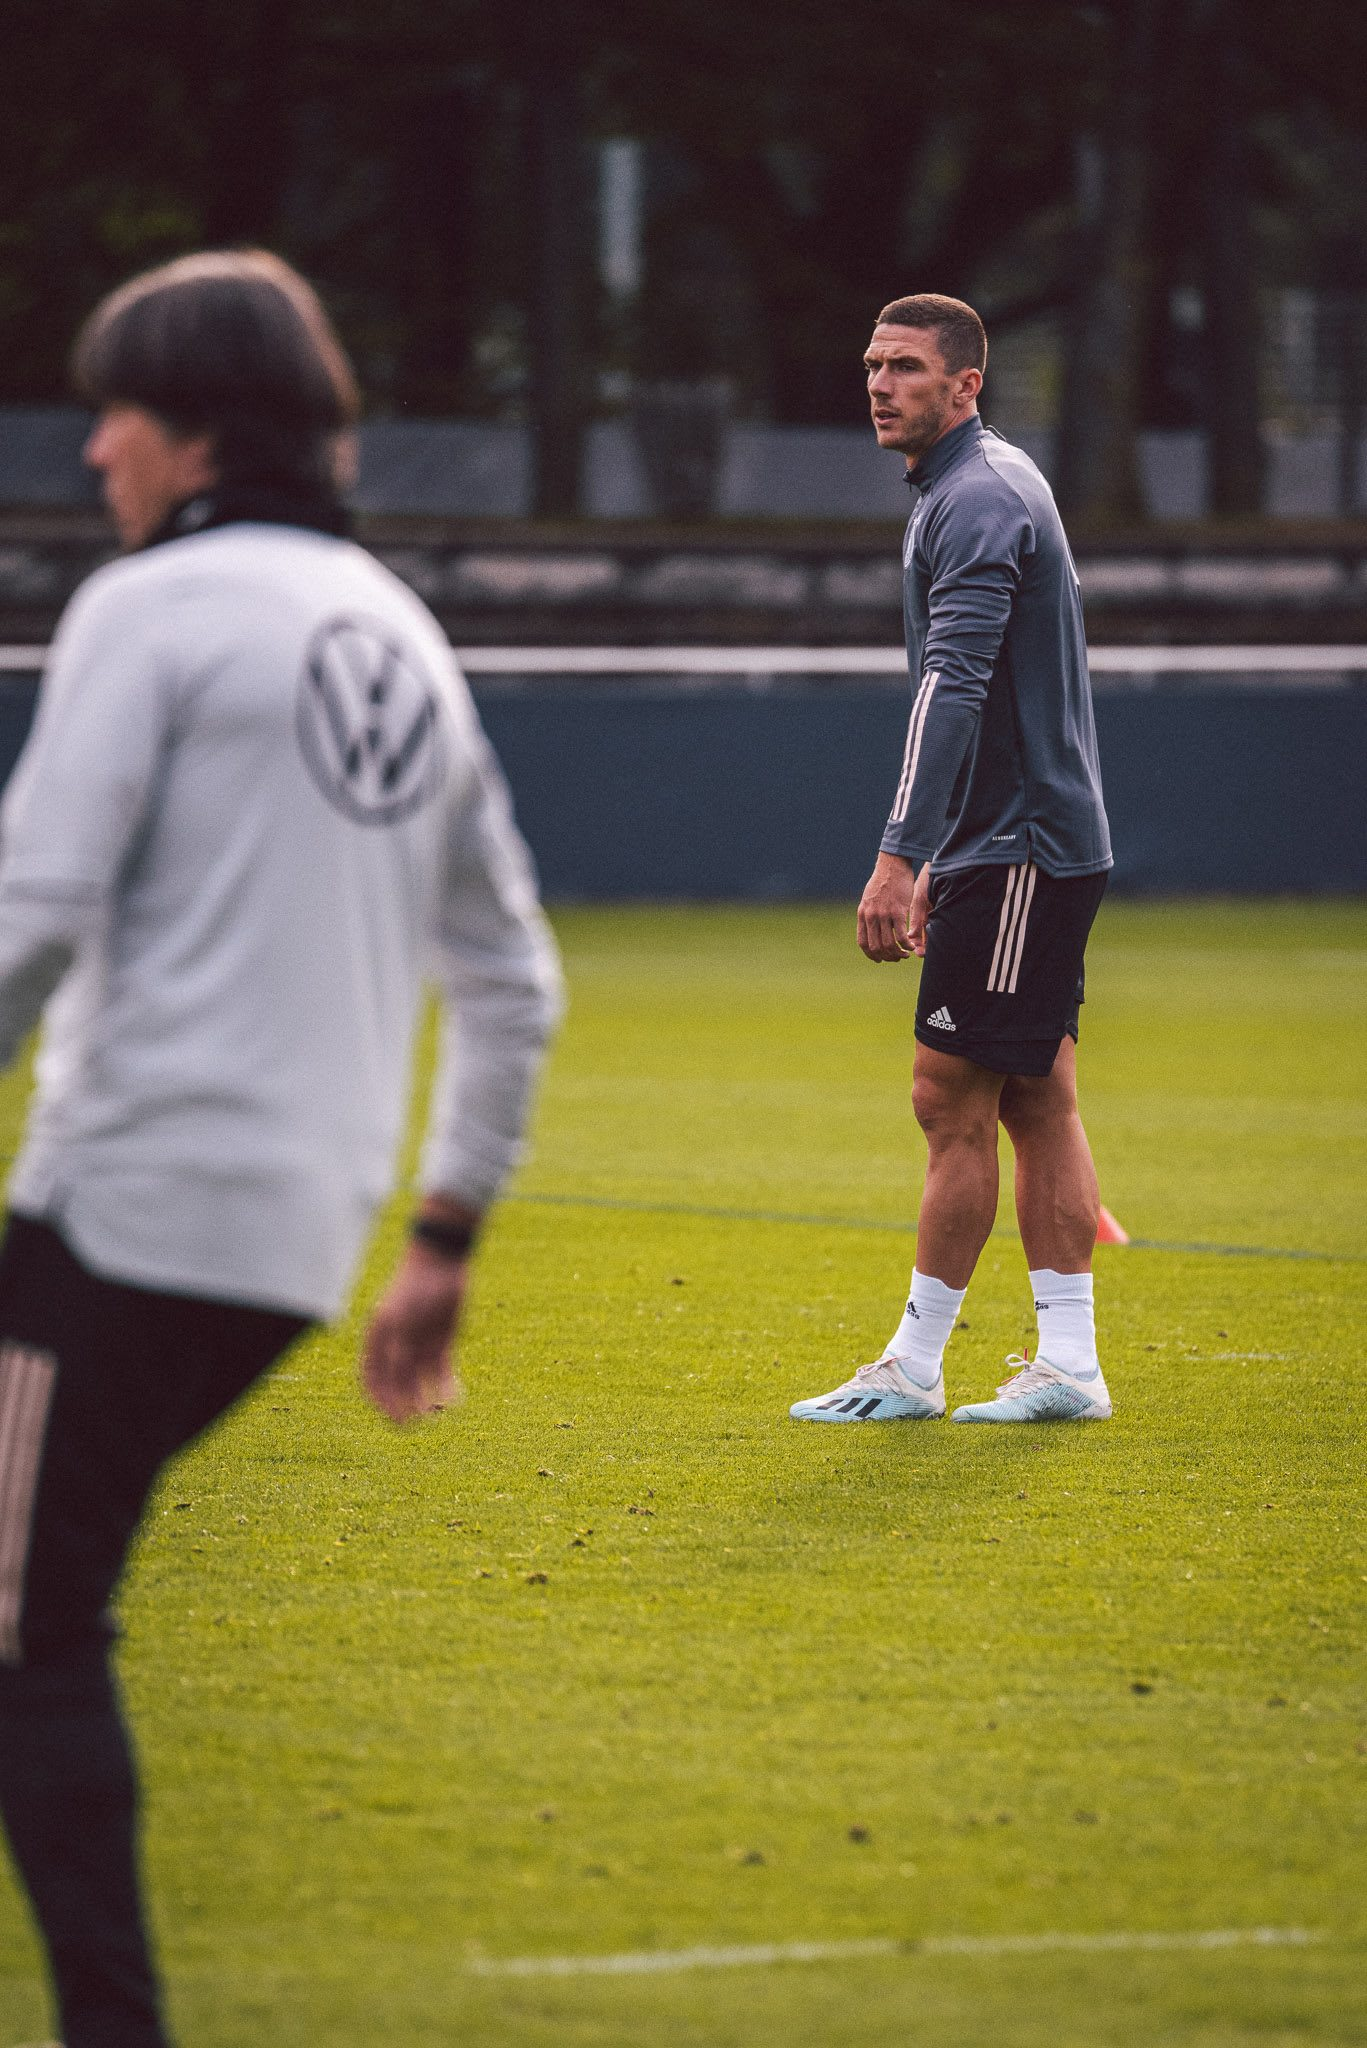 Men on a football field training together, Robin Gosens, footballer, football, German, Germany, team, adidas, sports, exercise, DFB